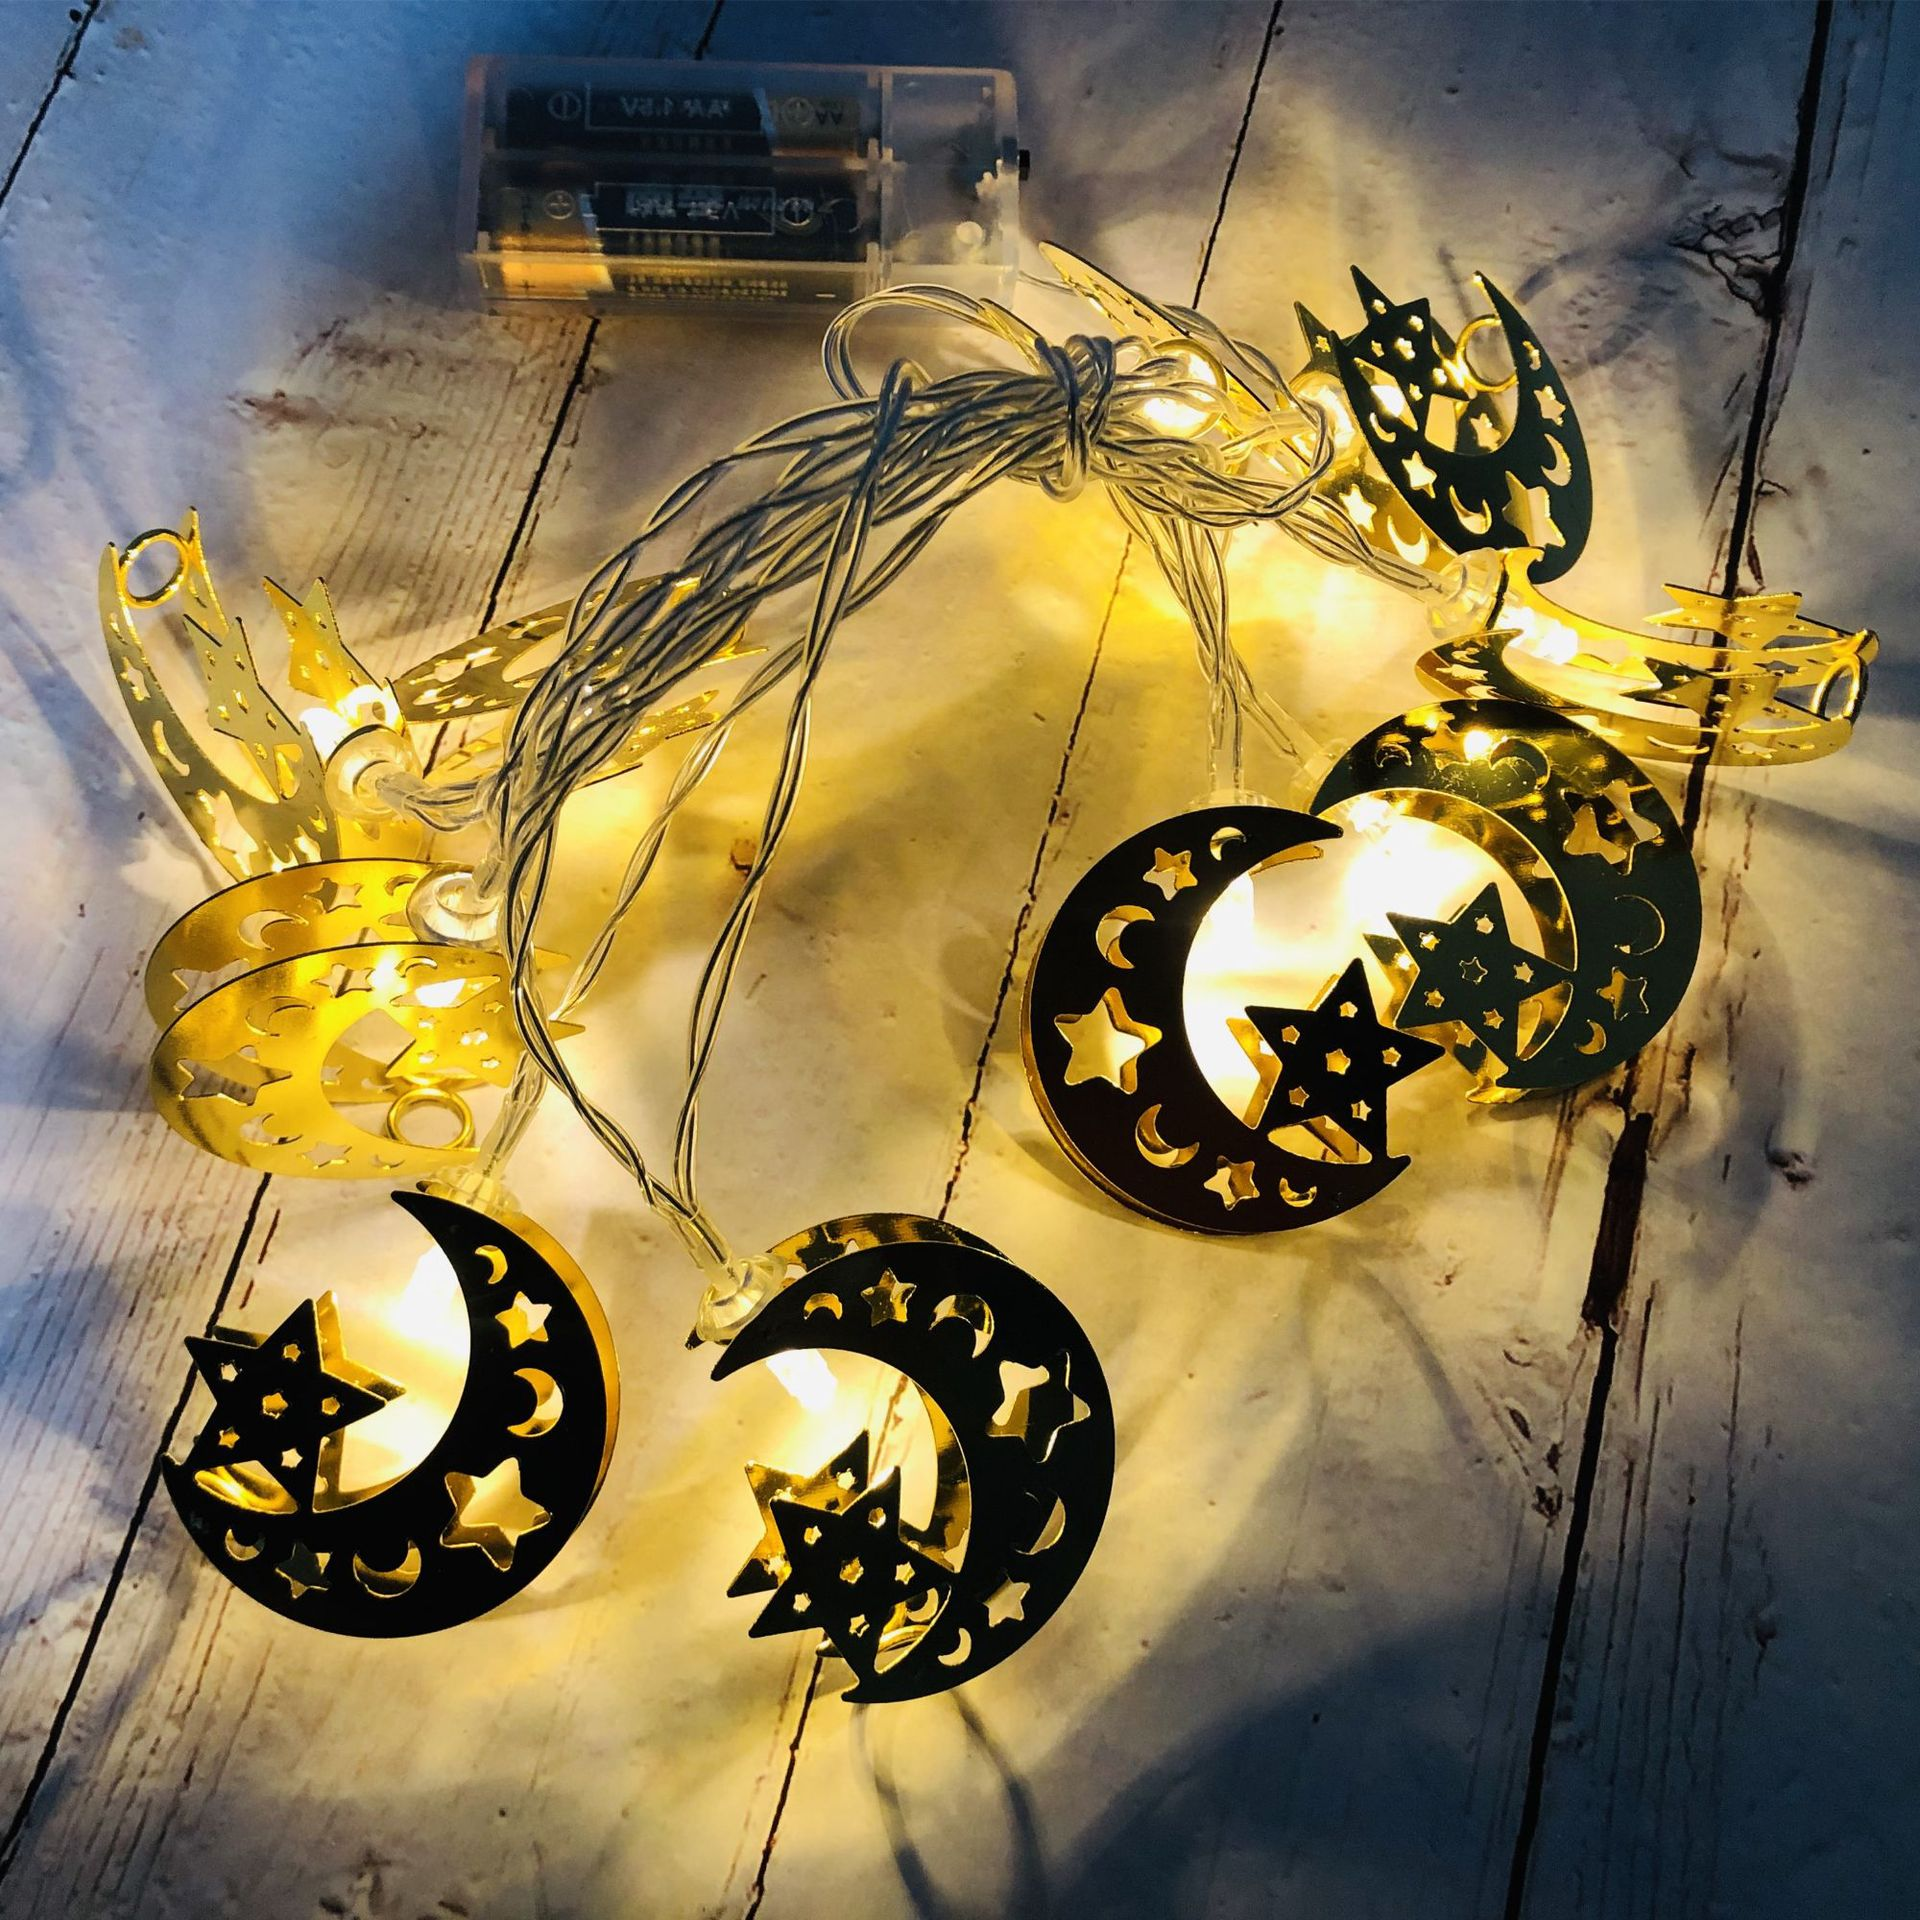 LED Iron Art Light Strings Muslim Ramadan Festival Star Moon Shape Decoration Hang Pendant Warm White